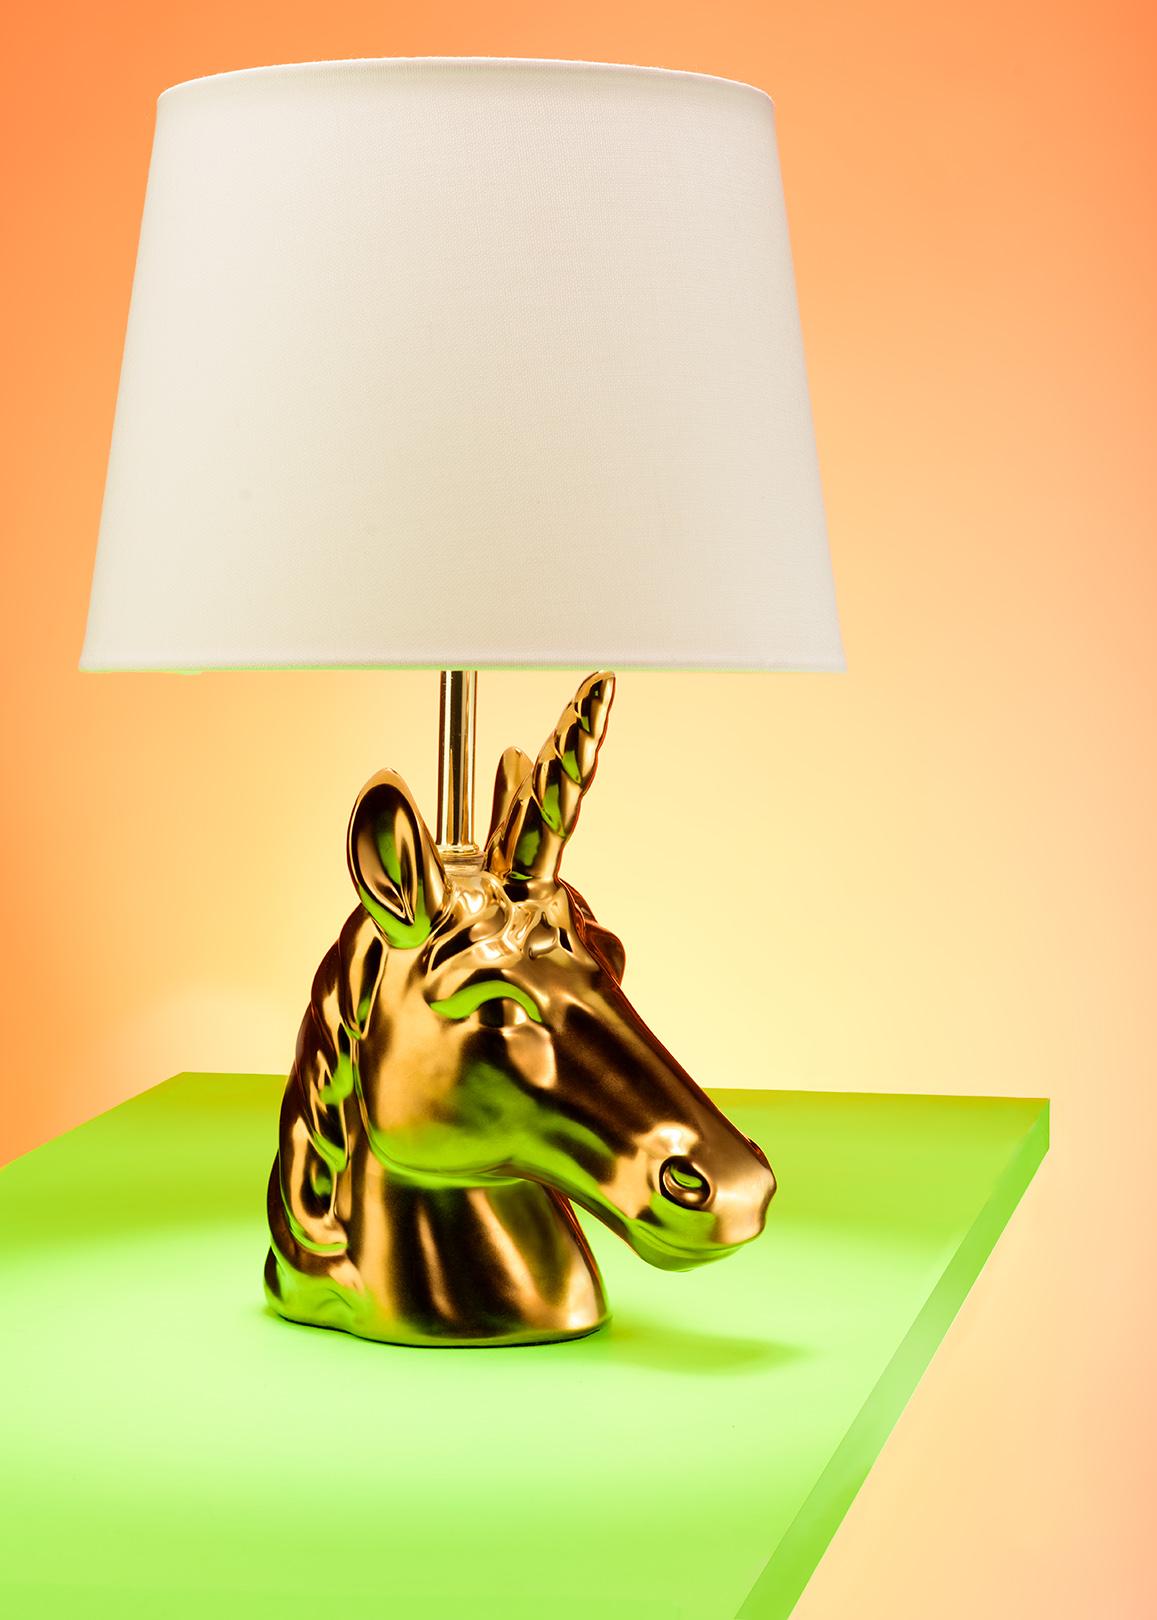 unicorn_lamp.jpg